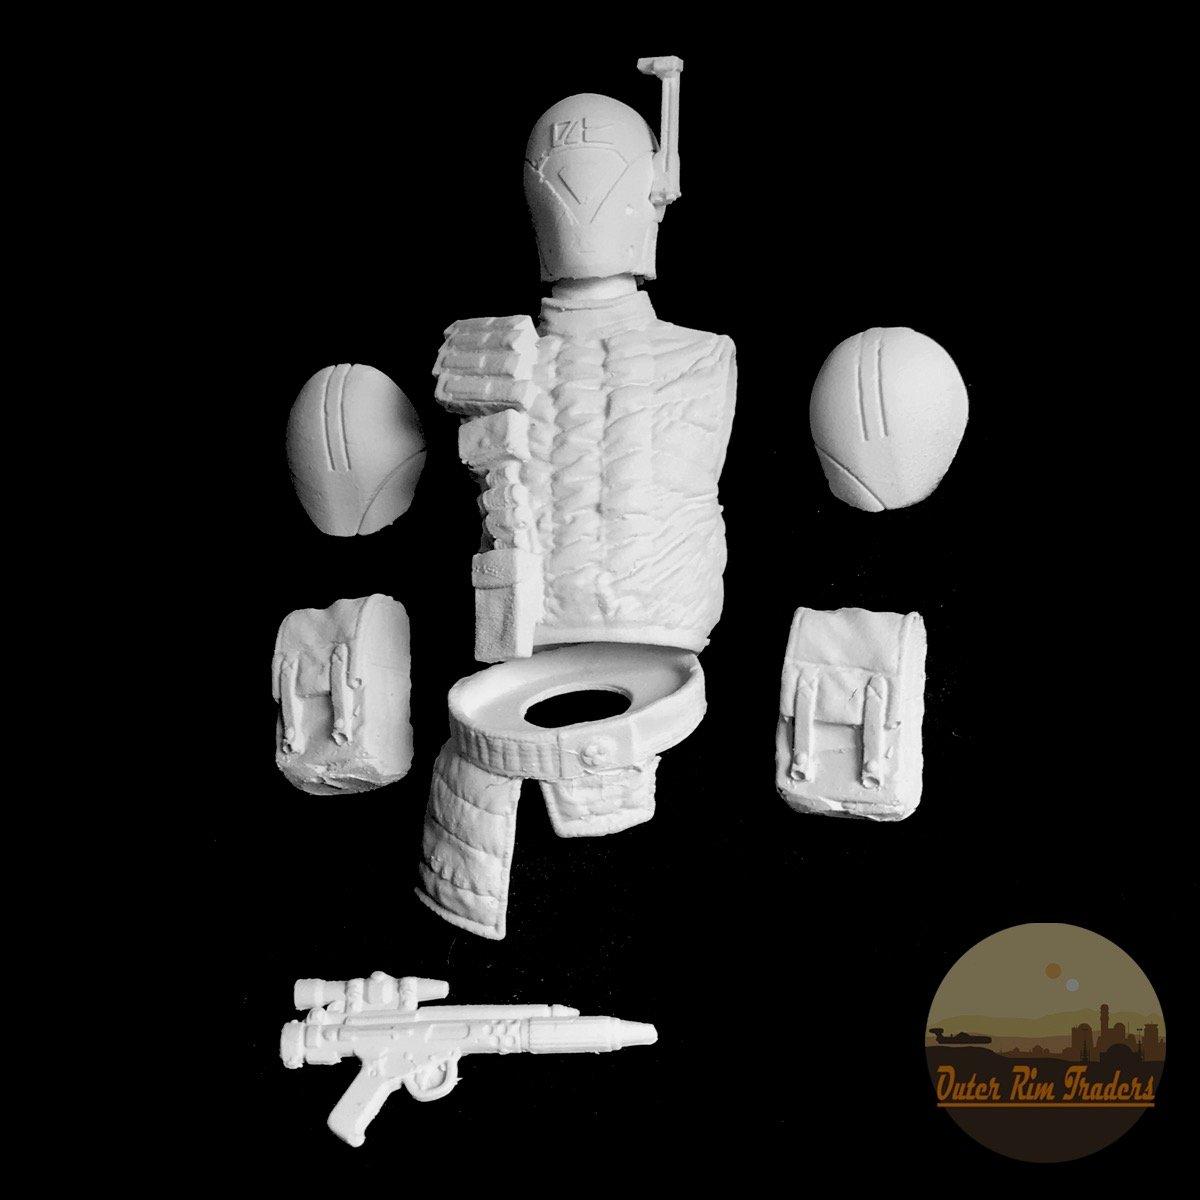 Image of Rogue Bounty Hunter Kit